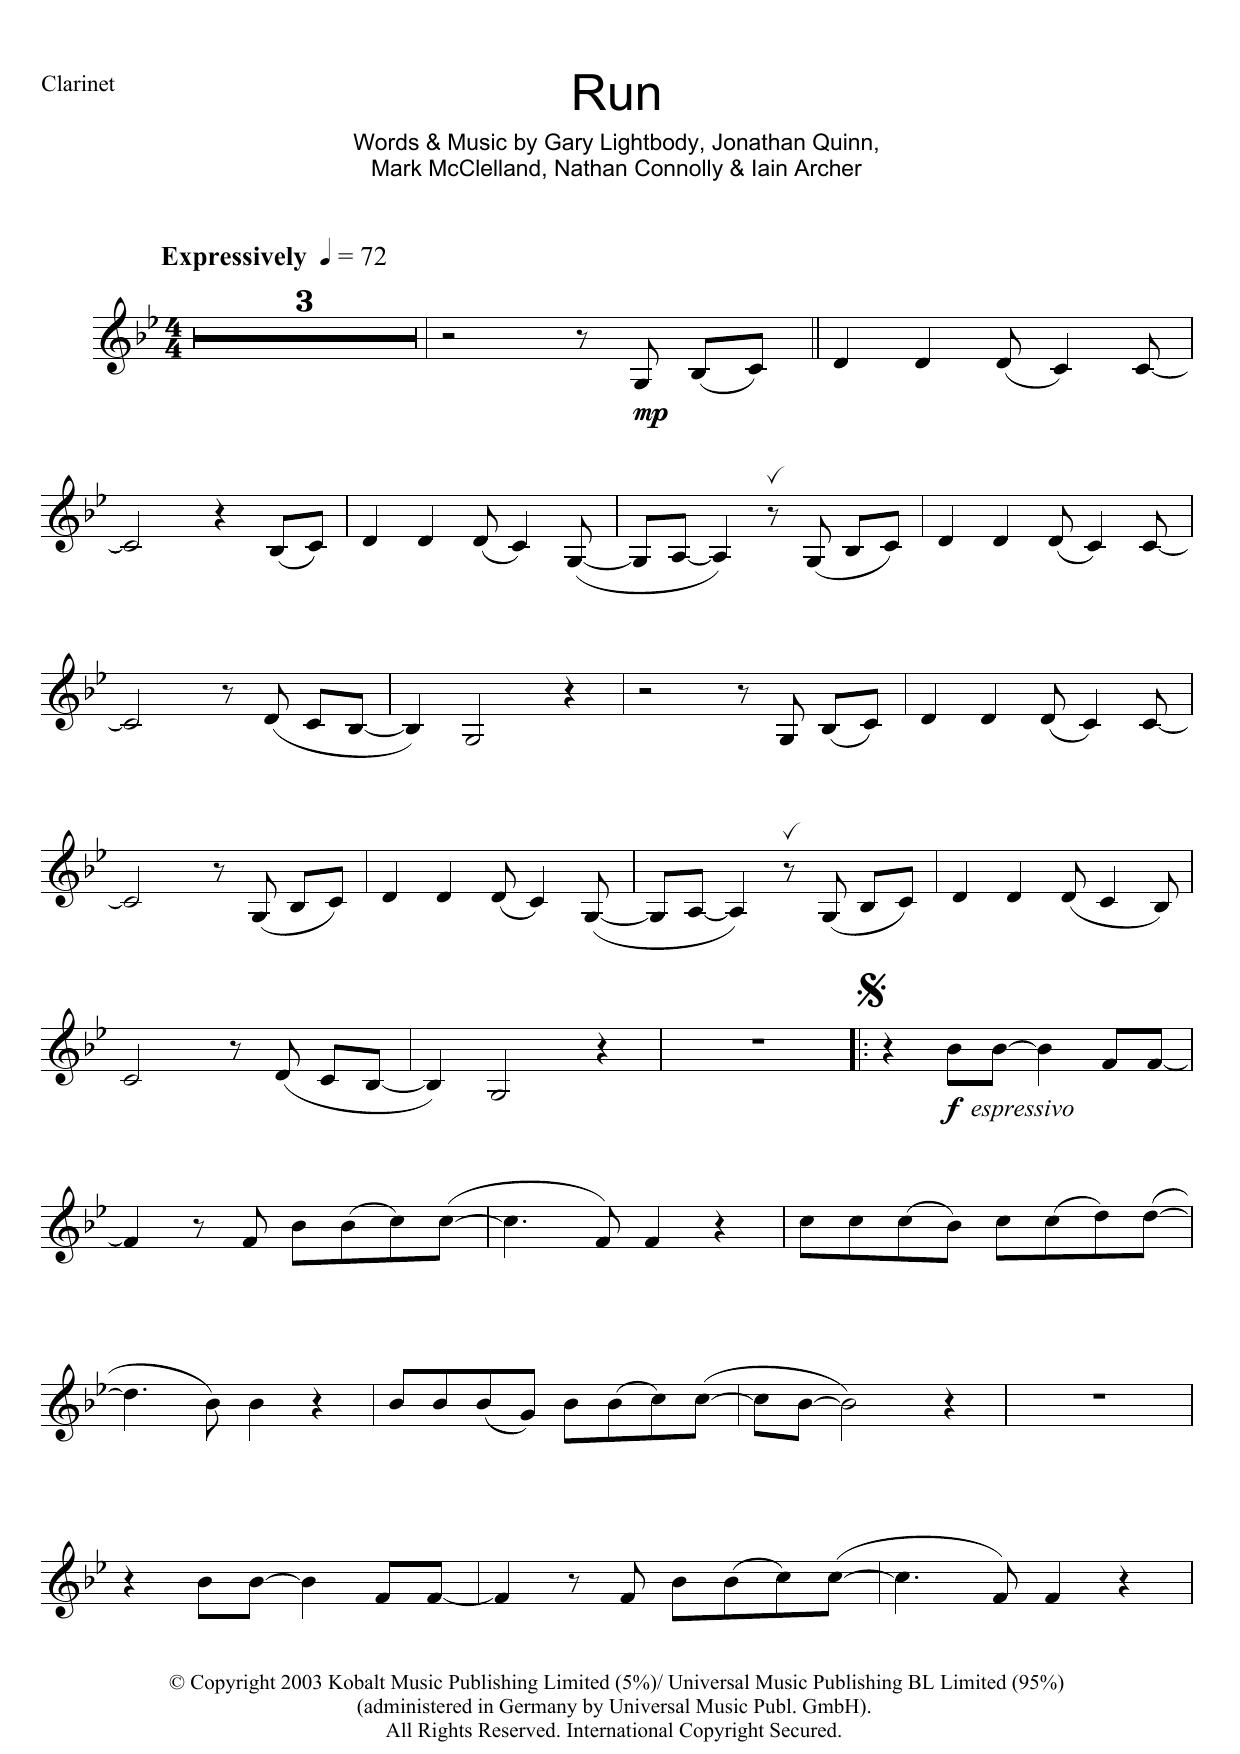 Leona Lewis - Run